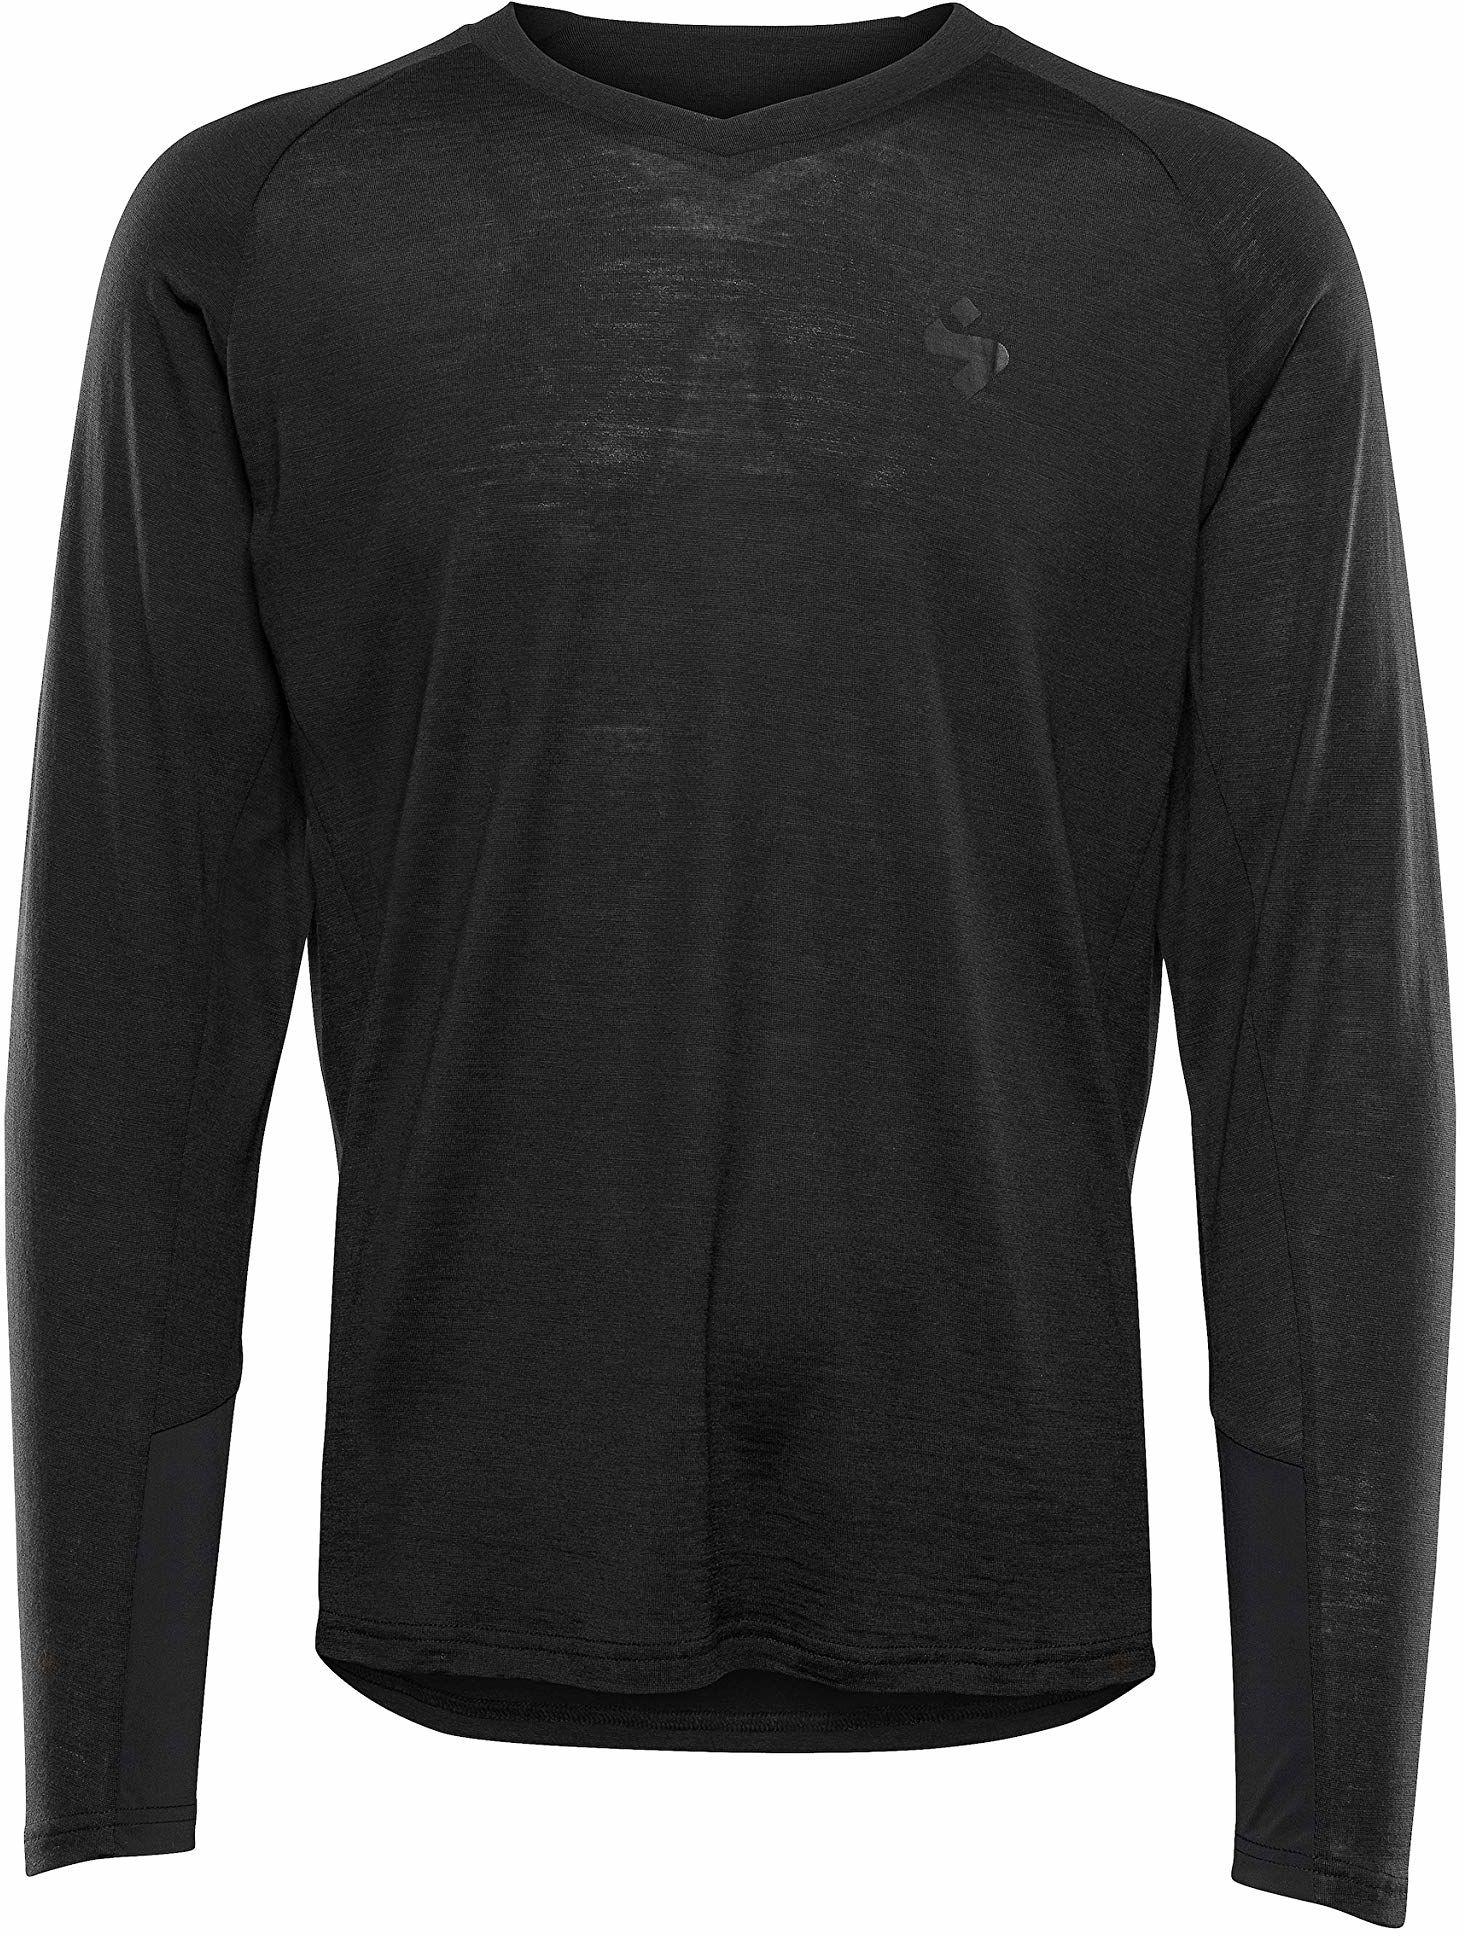 Sweet Protection Hunter Merino LS męska koszulka M, męska, koszulka, 828079, czarna, XL